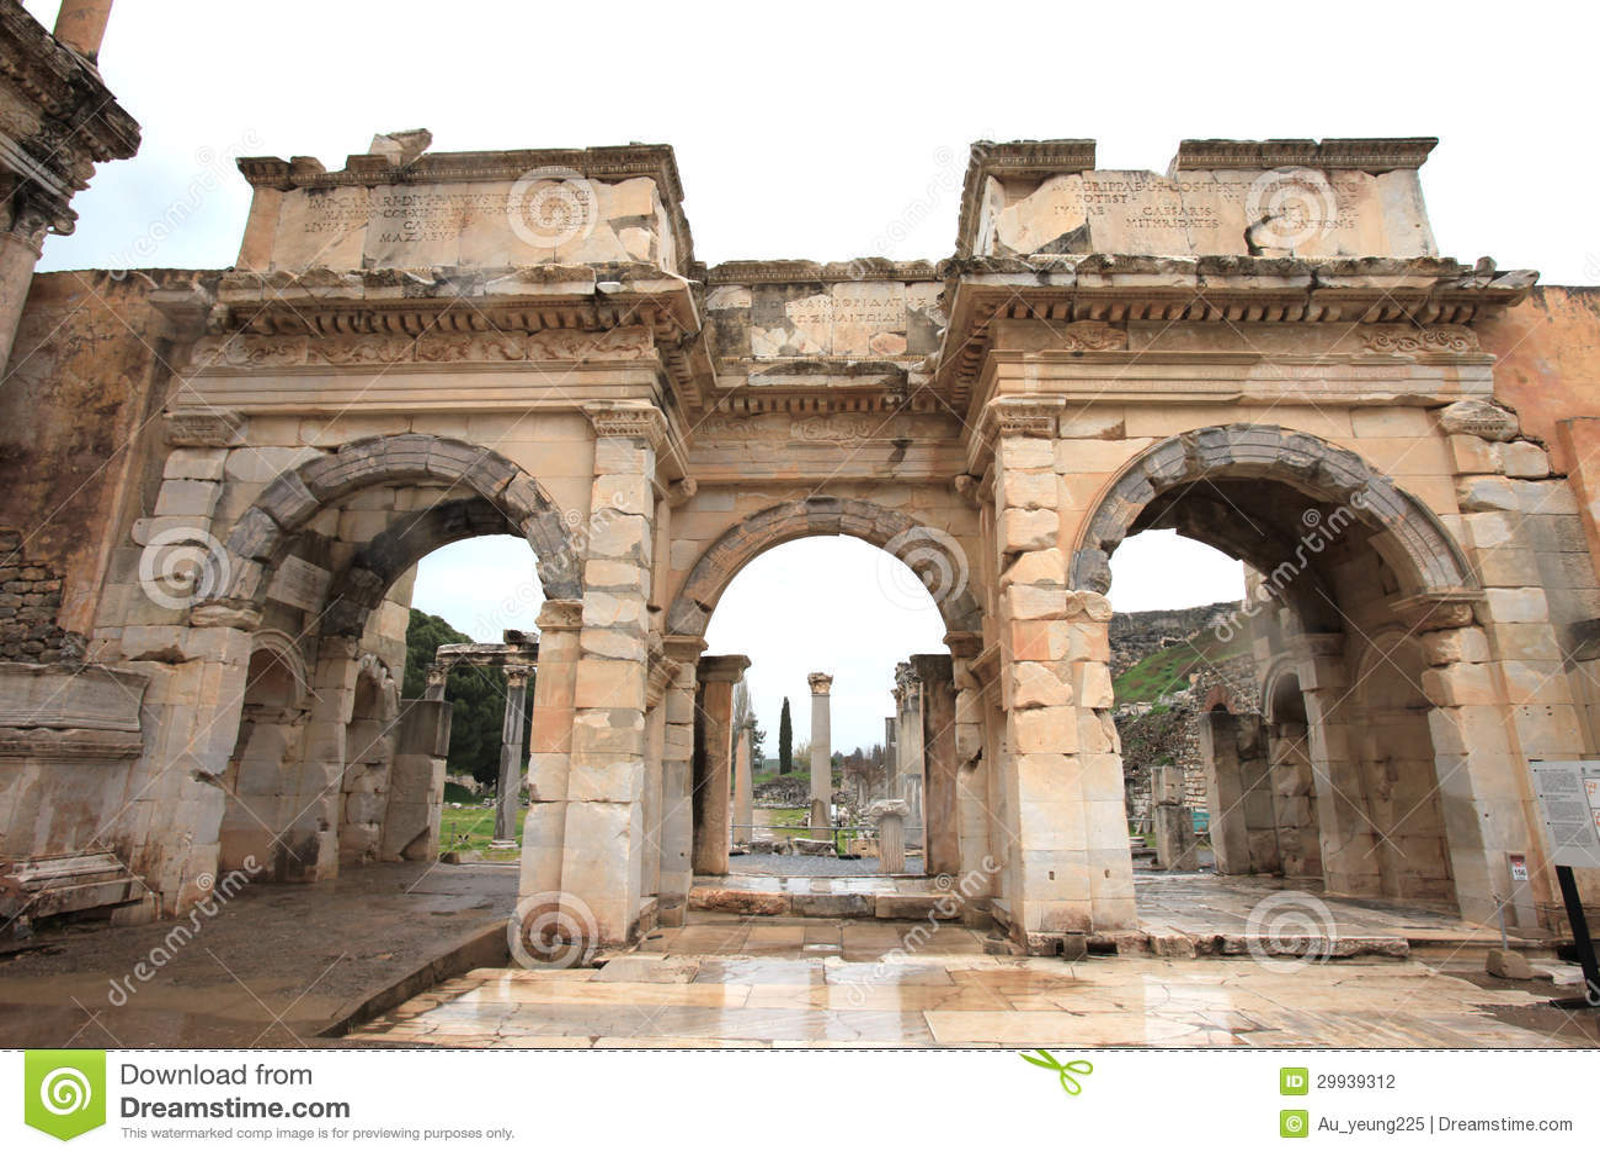 Ephesus Ruins Turkey Stock Photo Image Of Landmark